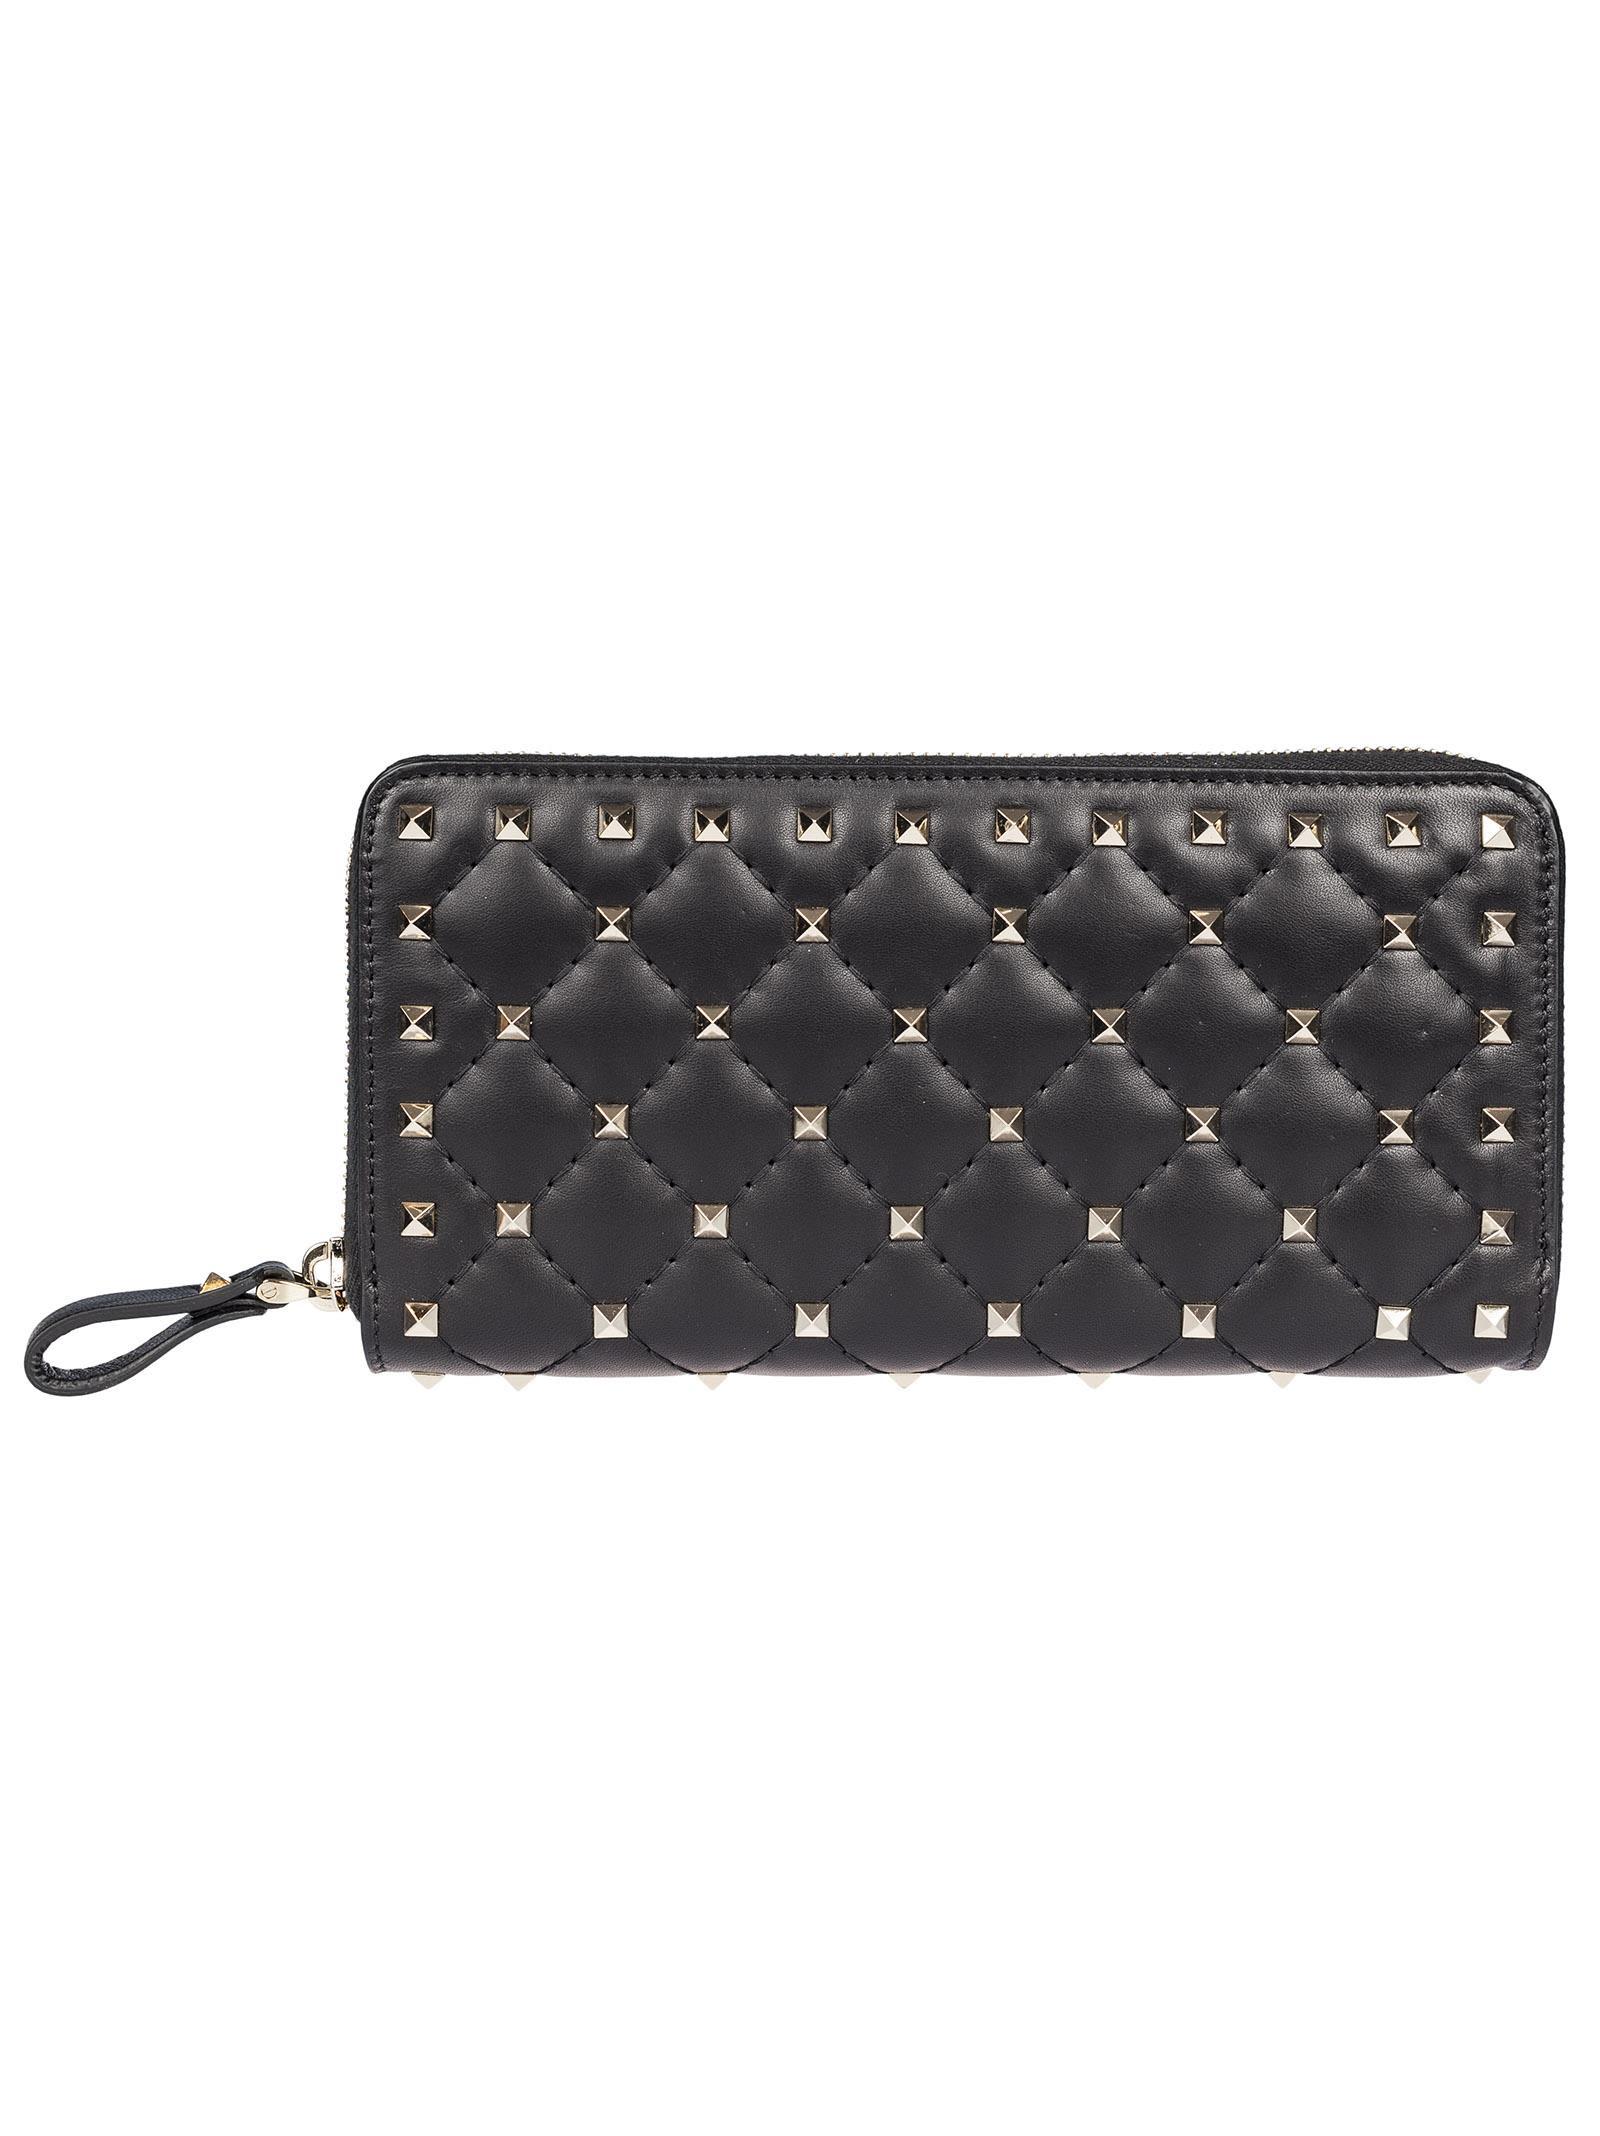 Valentino Rockstud Spike Zip Around Wallet  5e2f79a6cda3f